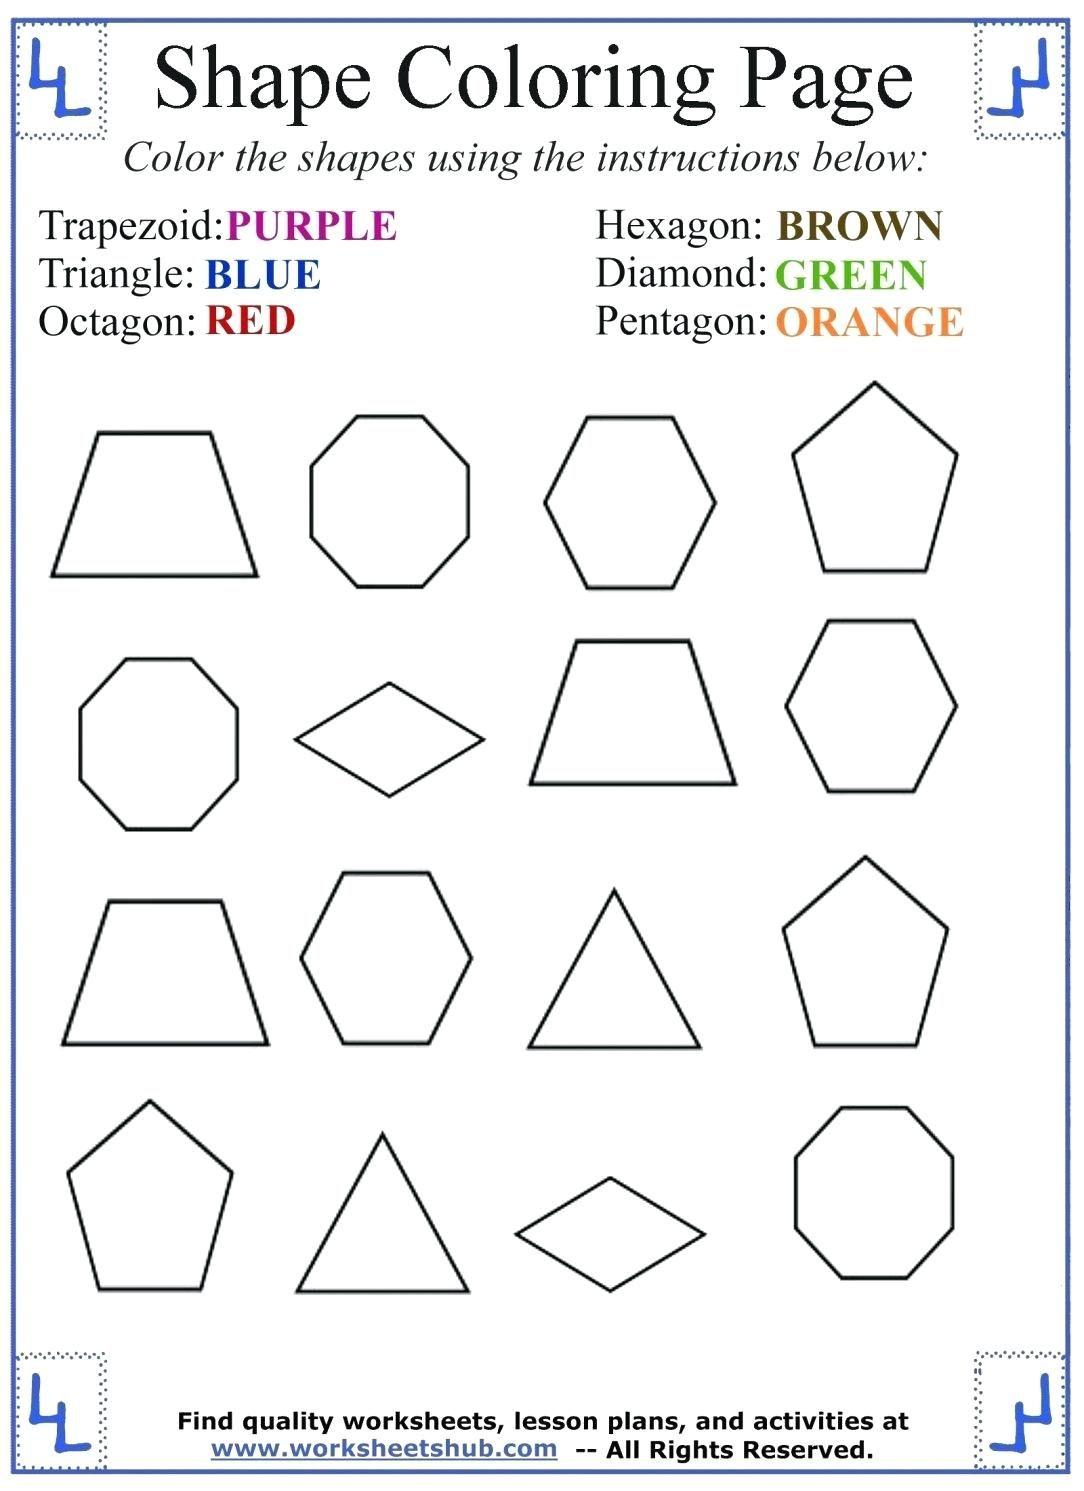 Shapes Coloring Pages Coloring Pages Shapes Coloring